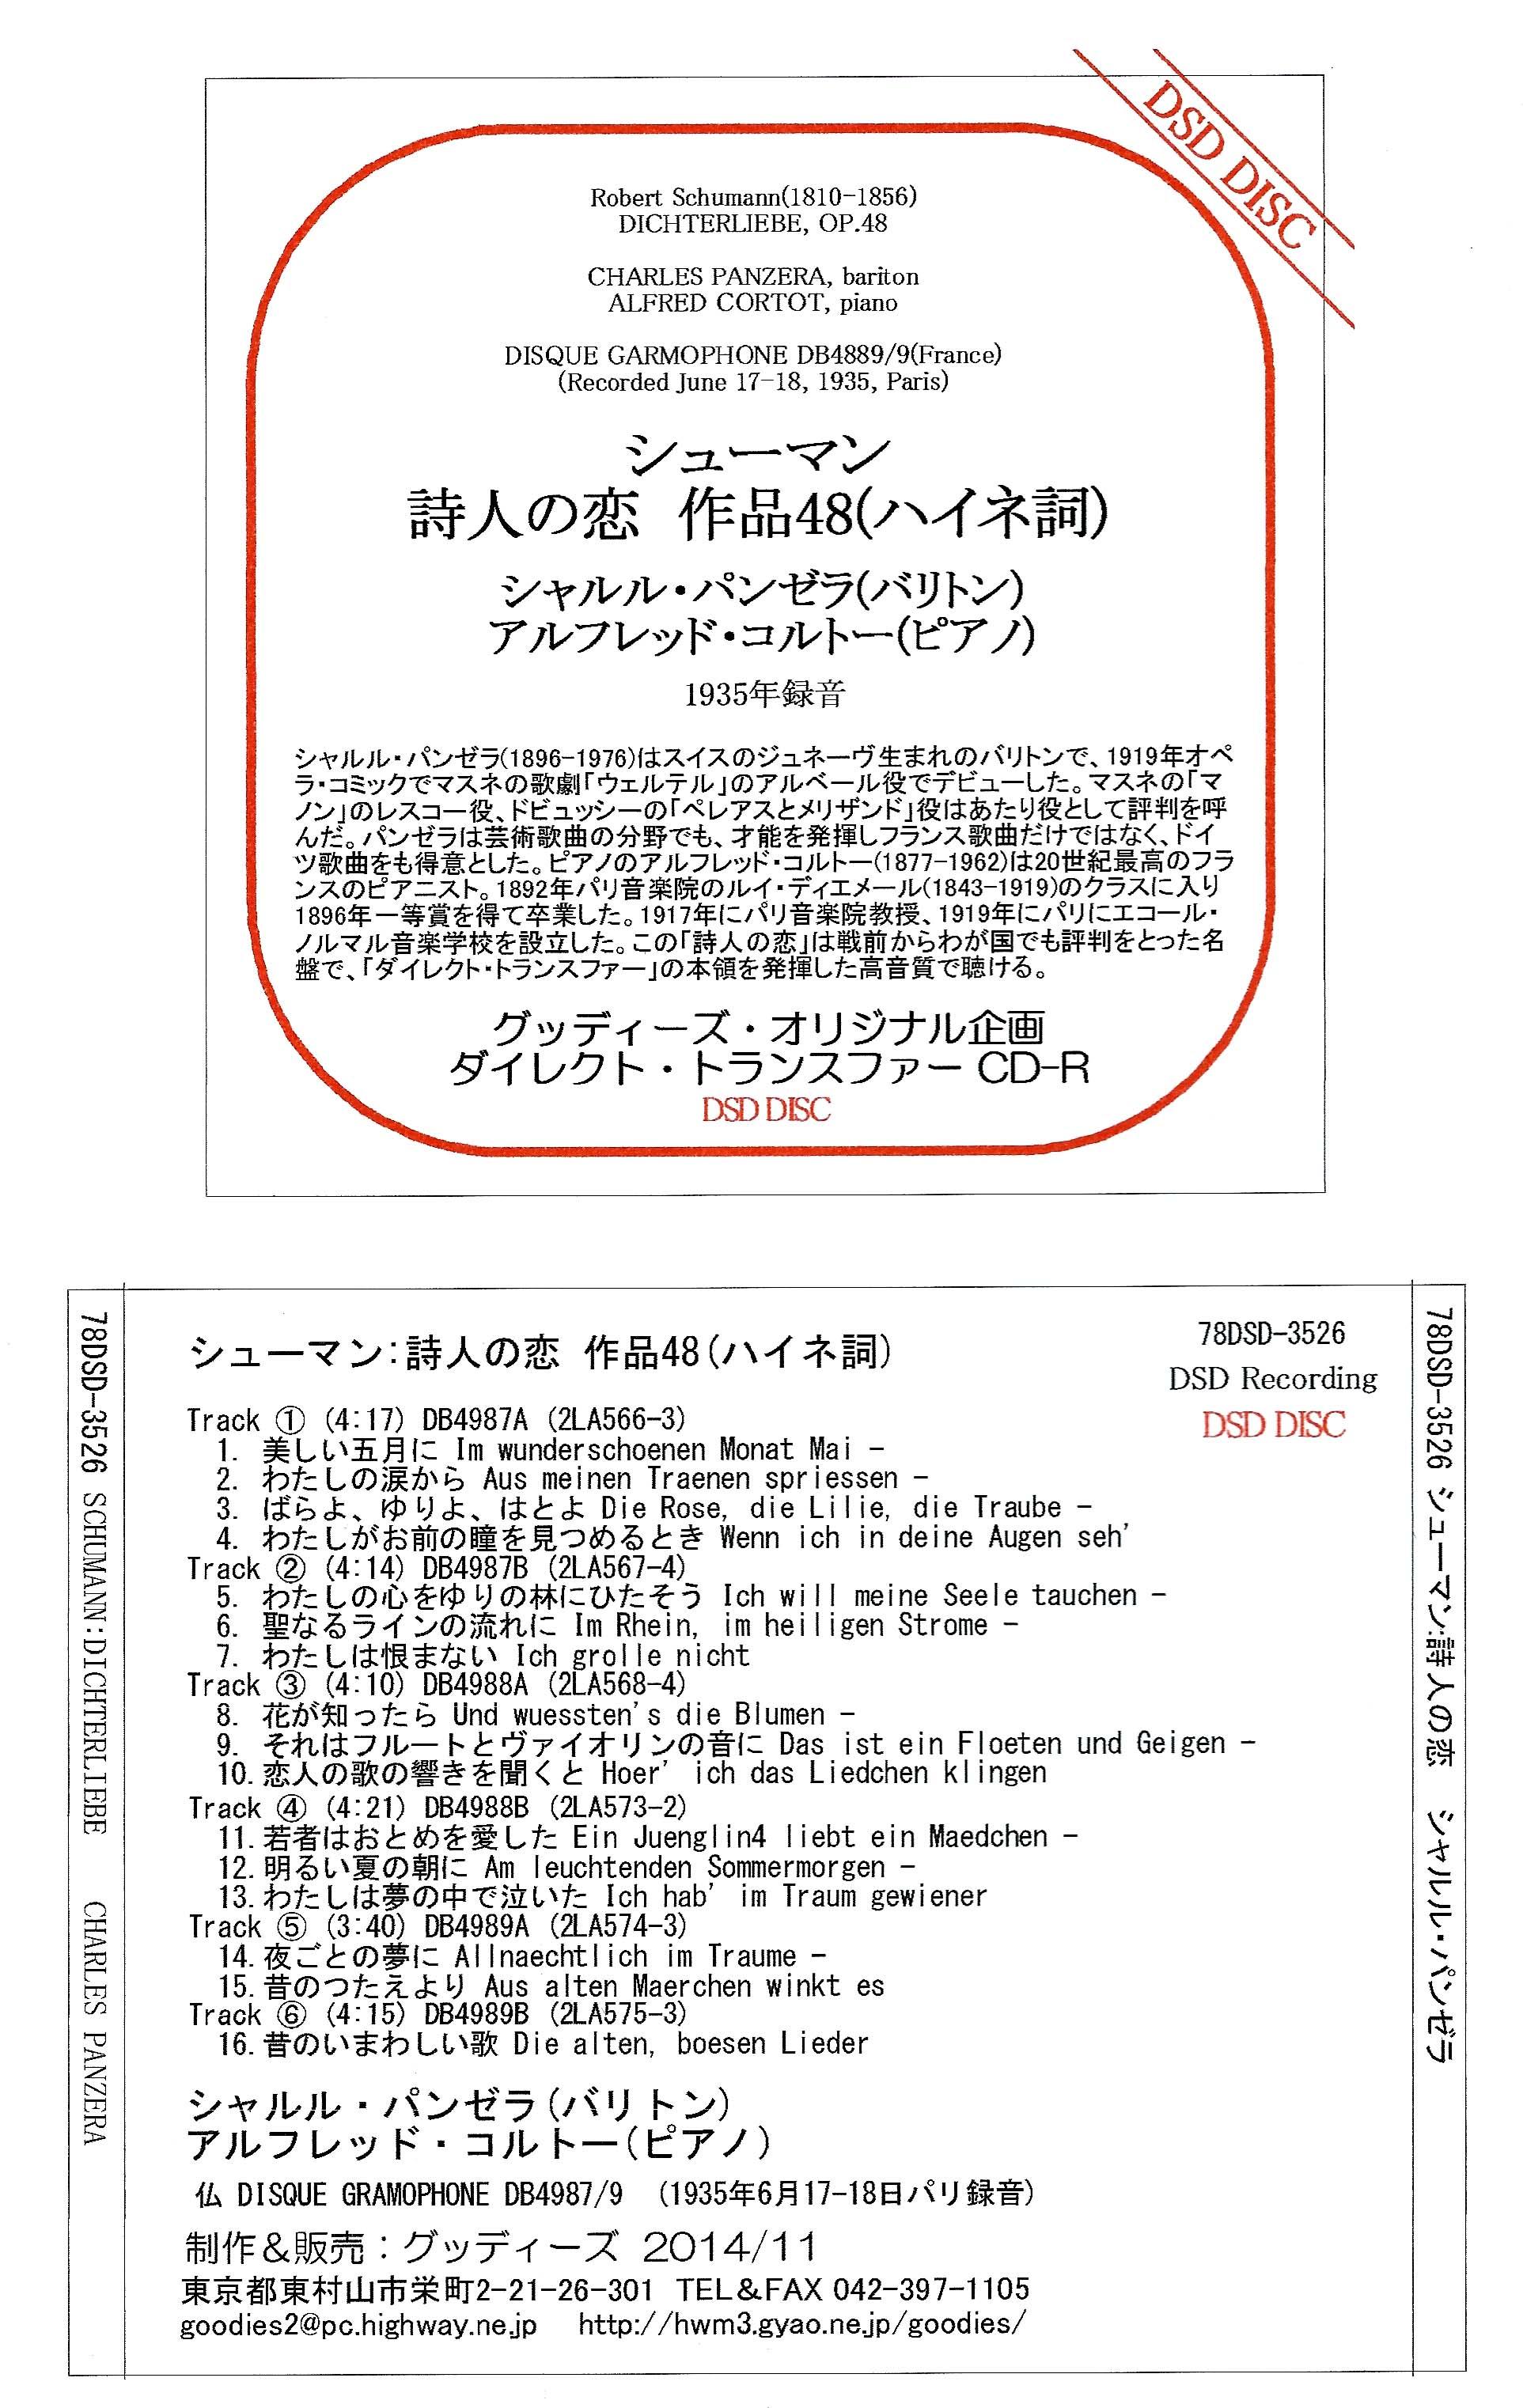 DSD audio ダウンロード販売